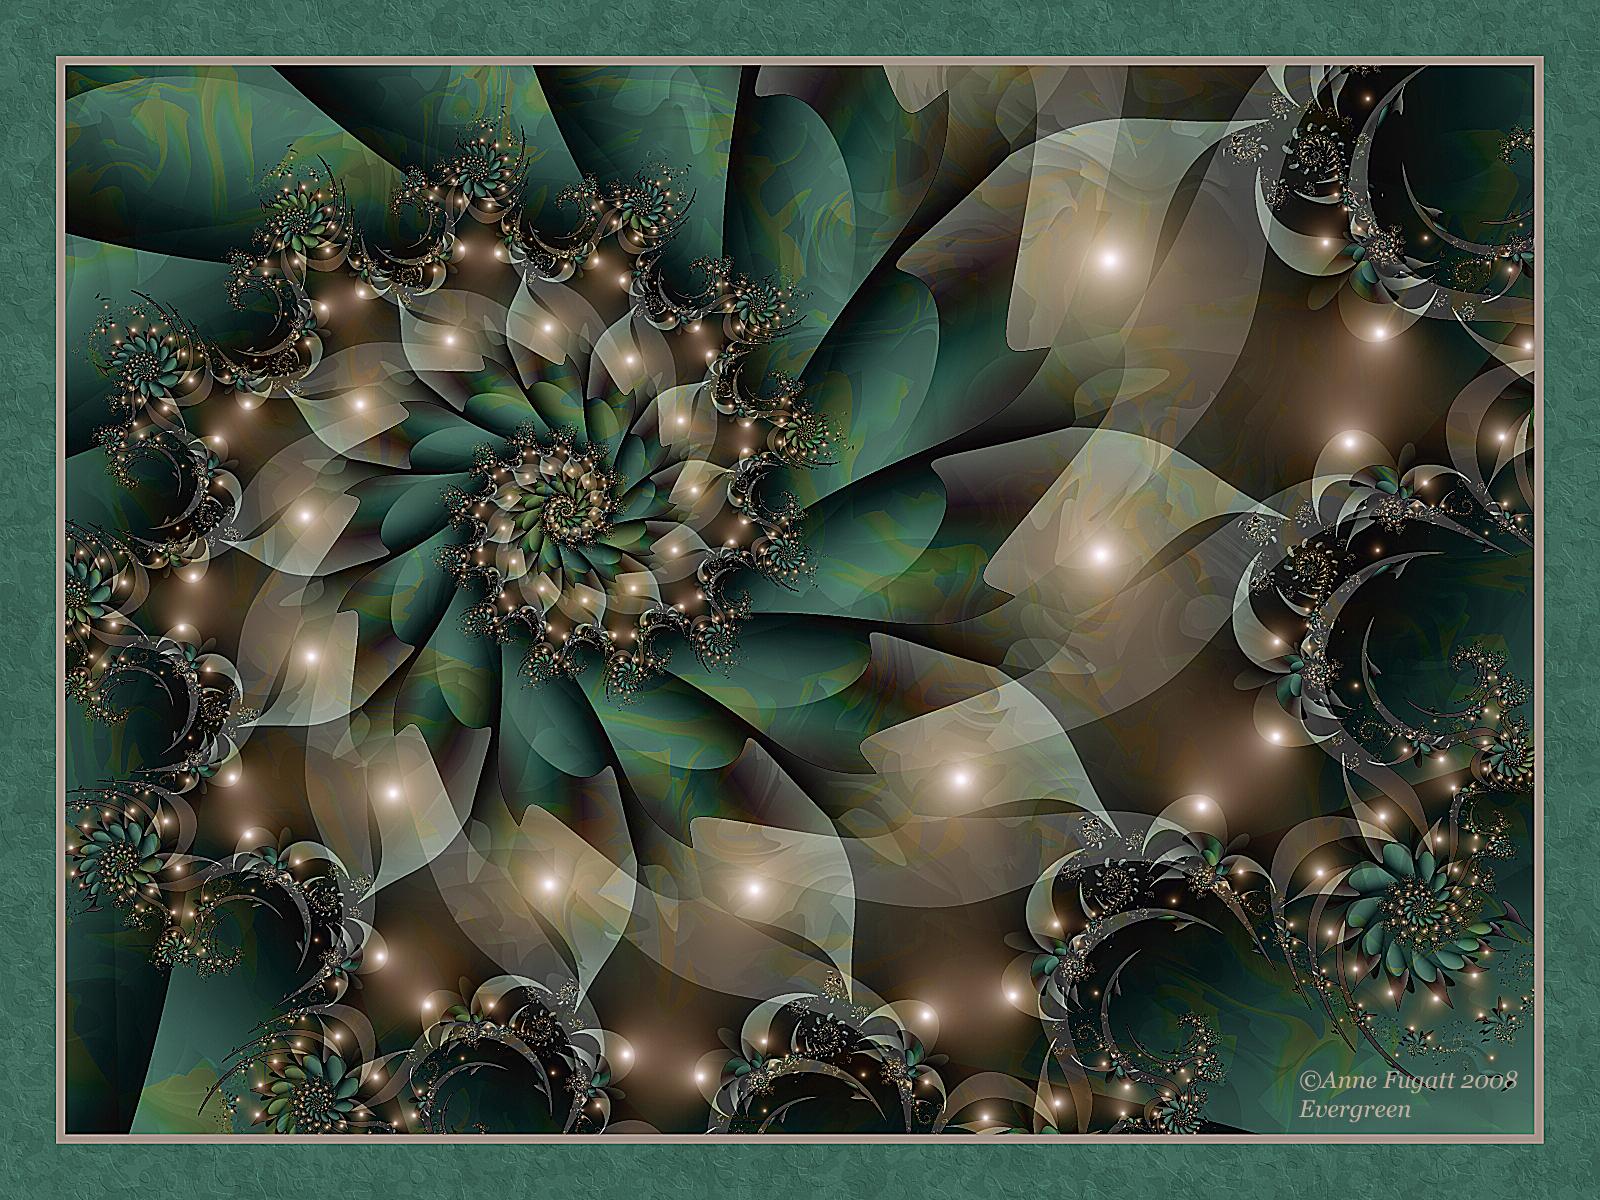 Evergreen by afugatt